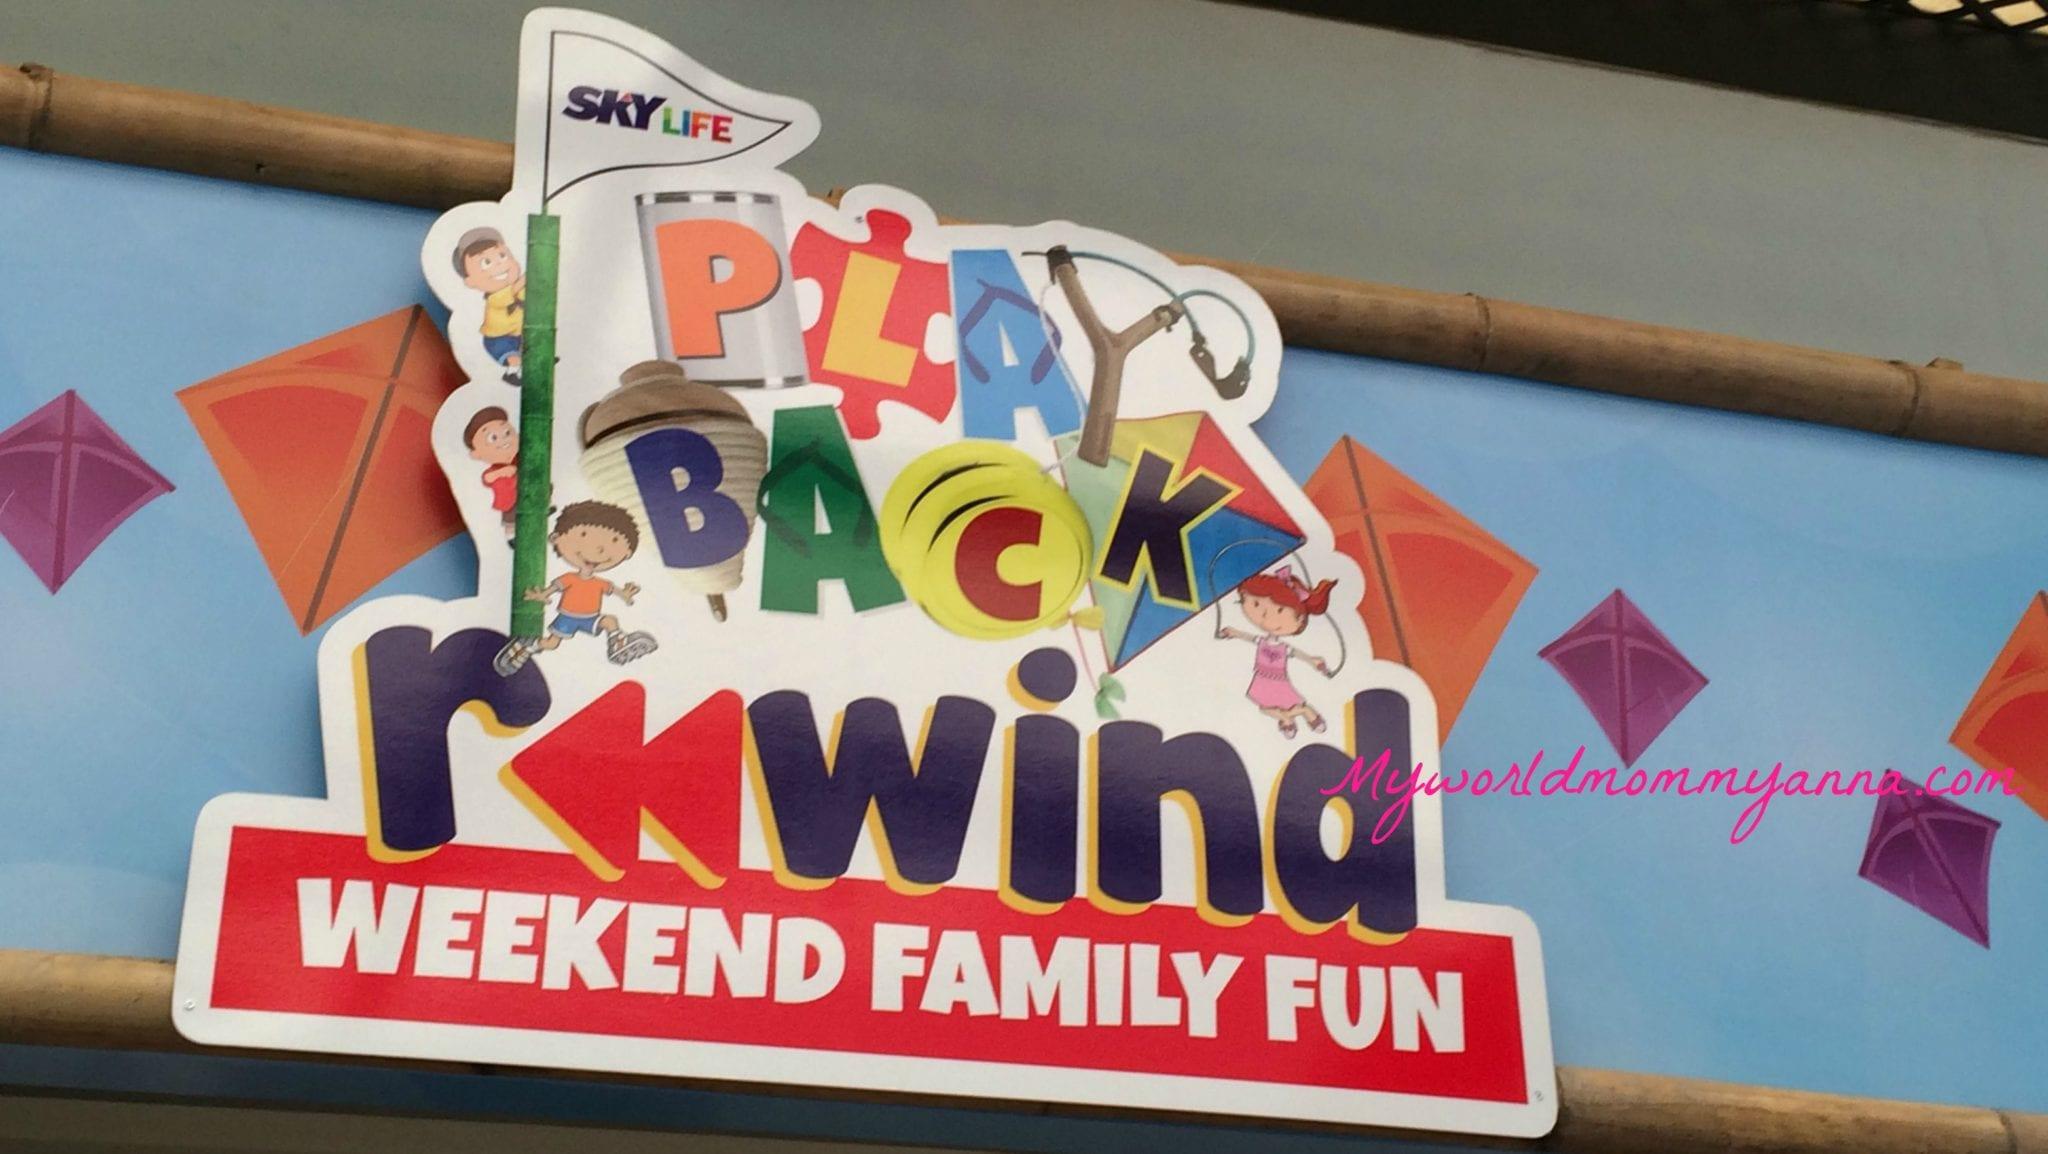 Little Kulit Sky Weekend Family Fun Playback Rewind My World Mommy Anna The wonderful pinoyteleseryerewind video downloader is a. mommy anna